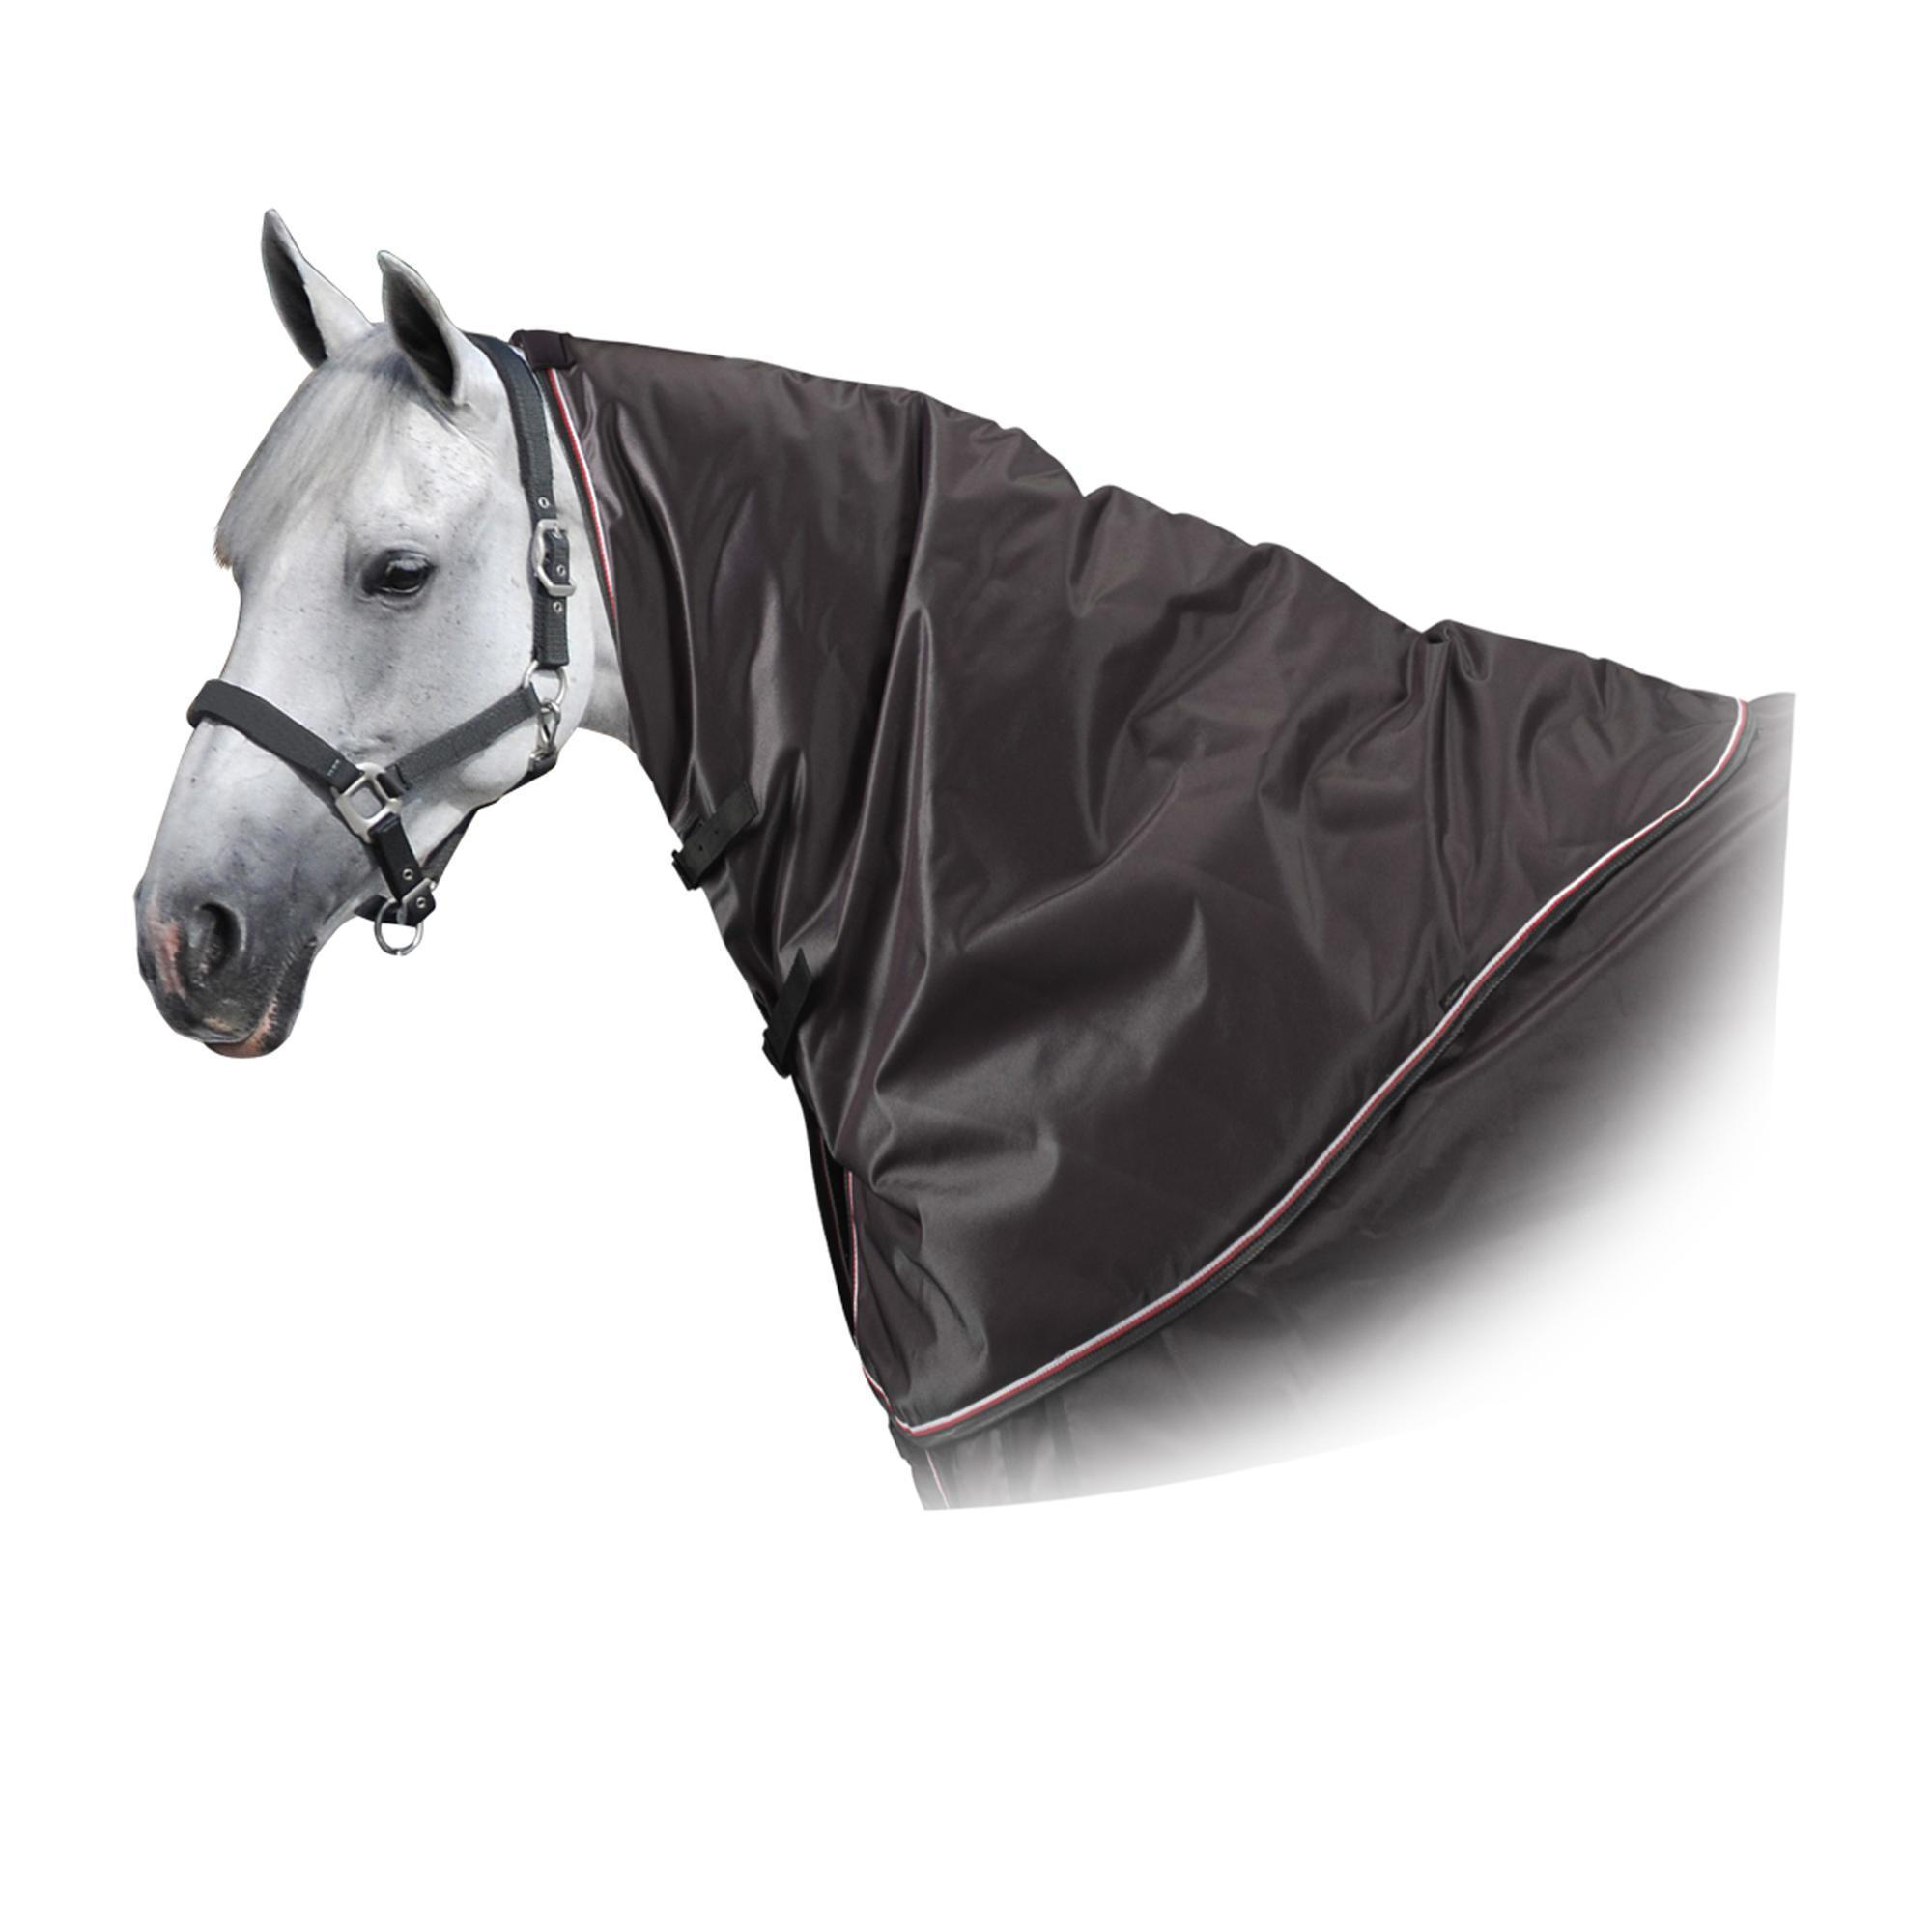 tour de cou quitation cheval allweather 500 anthracite. Black Bedroom Furniture Sets. Home Design Ideas